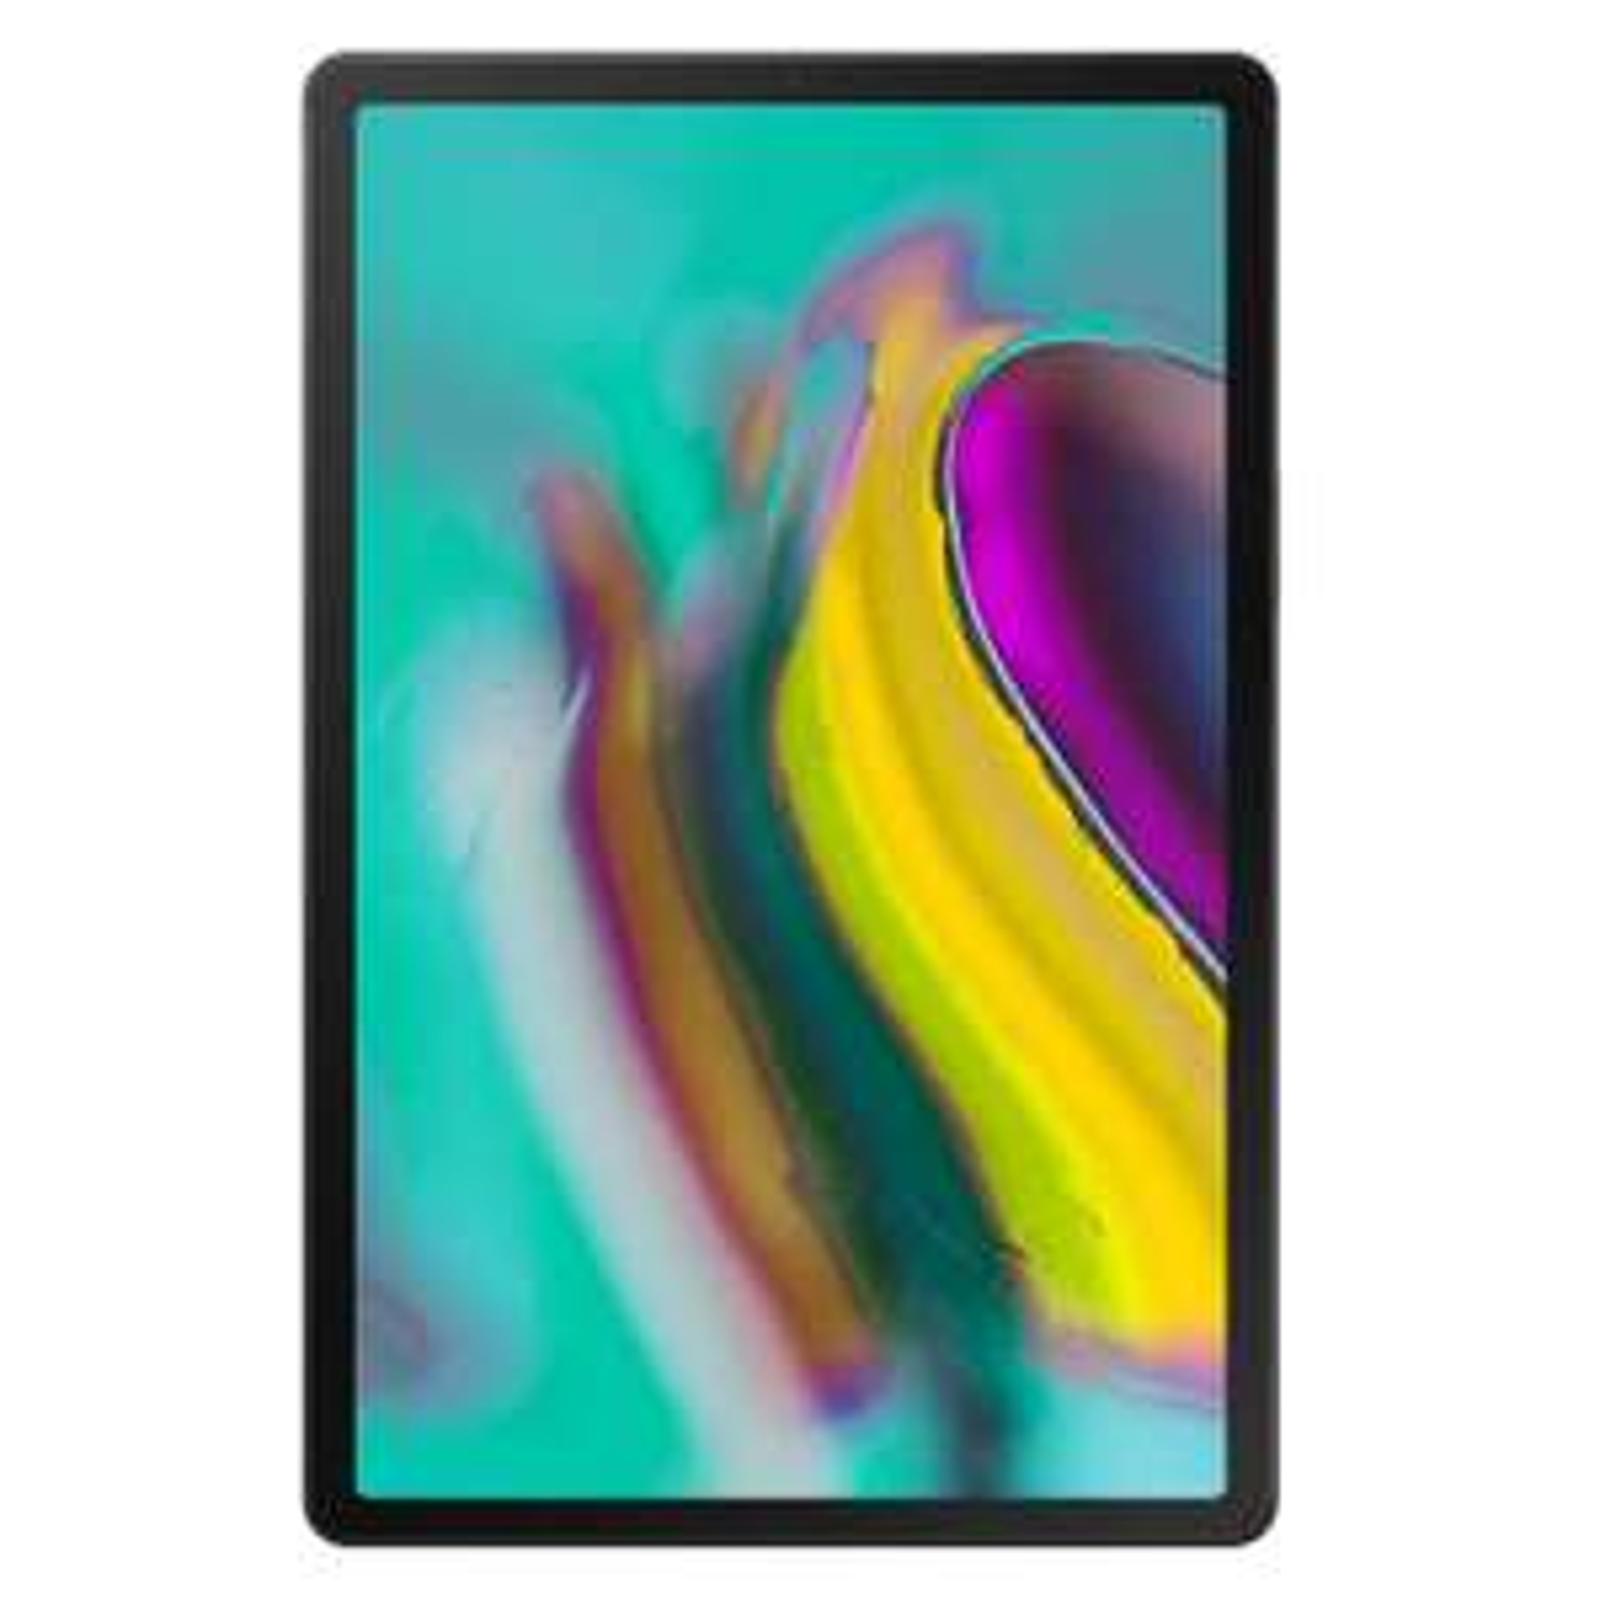 "Galaxy Tab S5e 64/4GB Tablet (10.5"" WQHD+ Super Amoled, Snapdragon 670, 7040mAh Akku)"